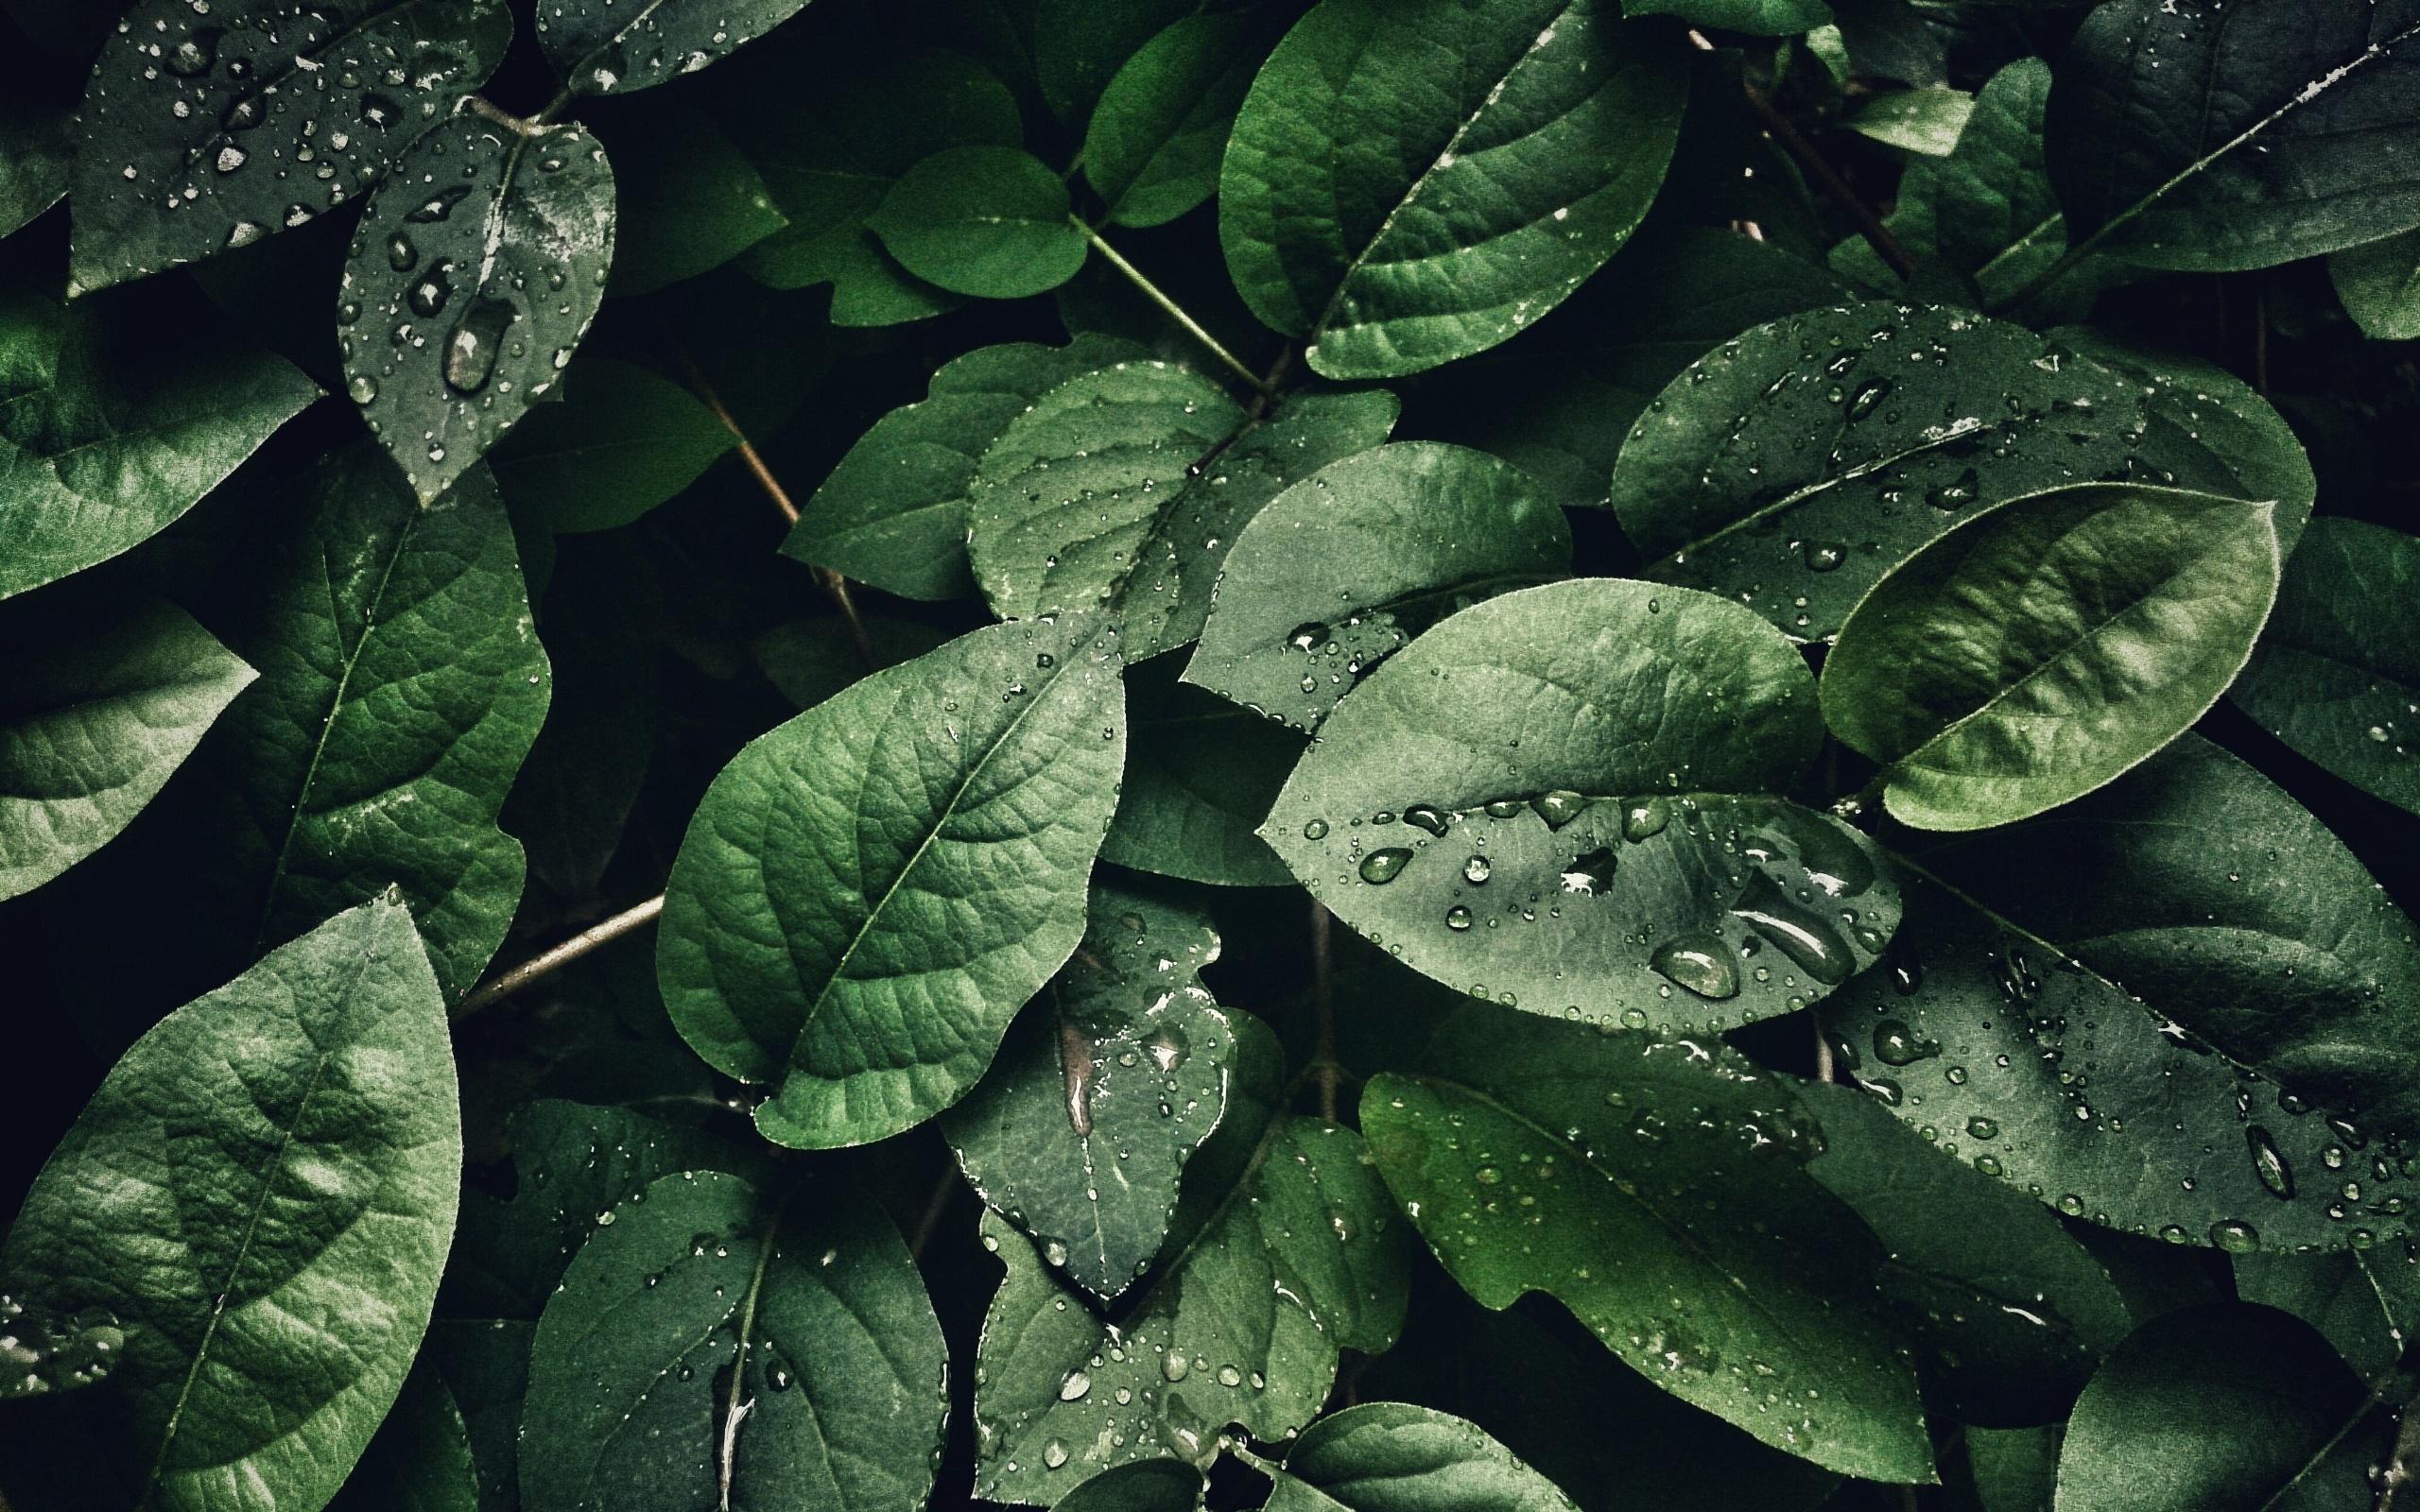 wallpaper hijau tanaman daun